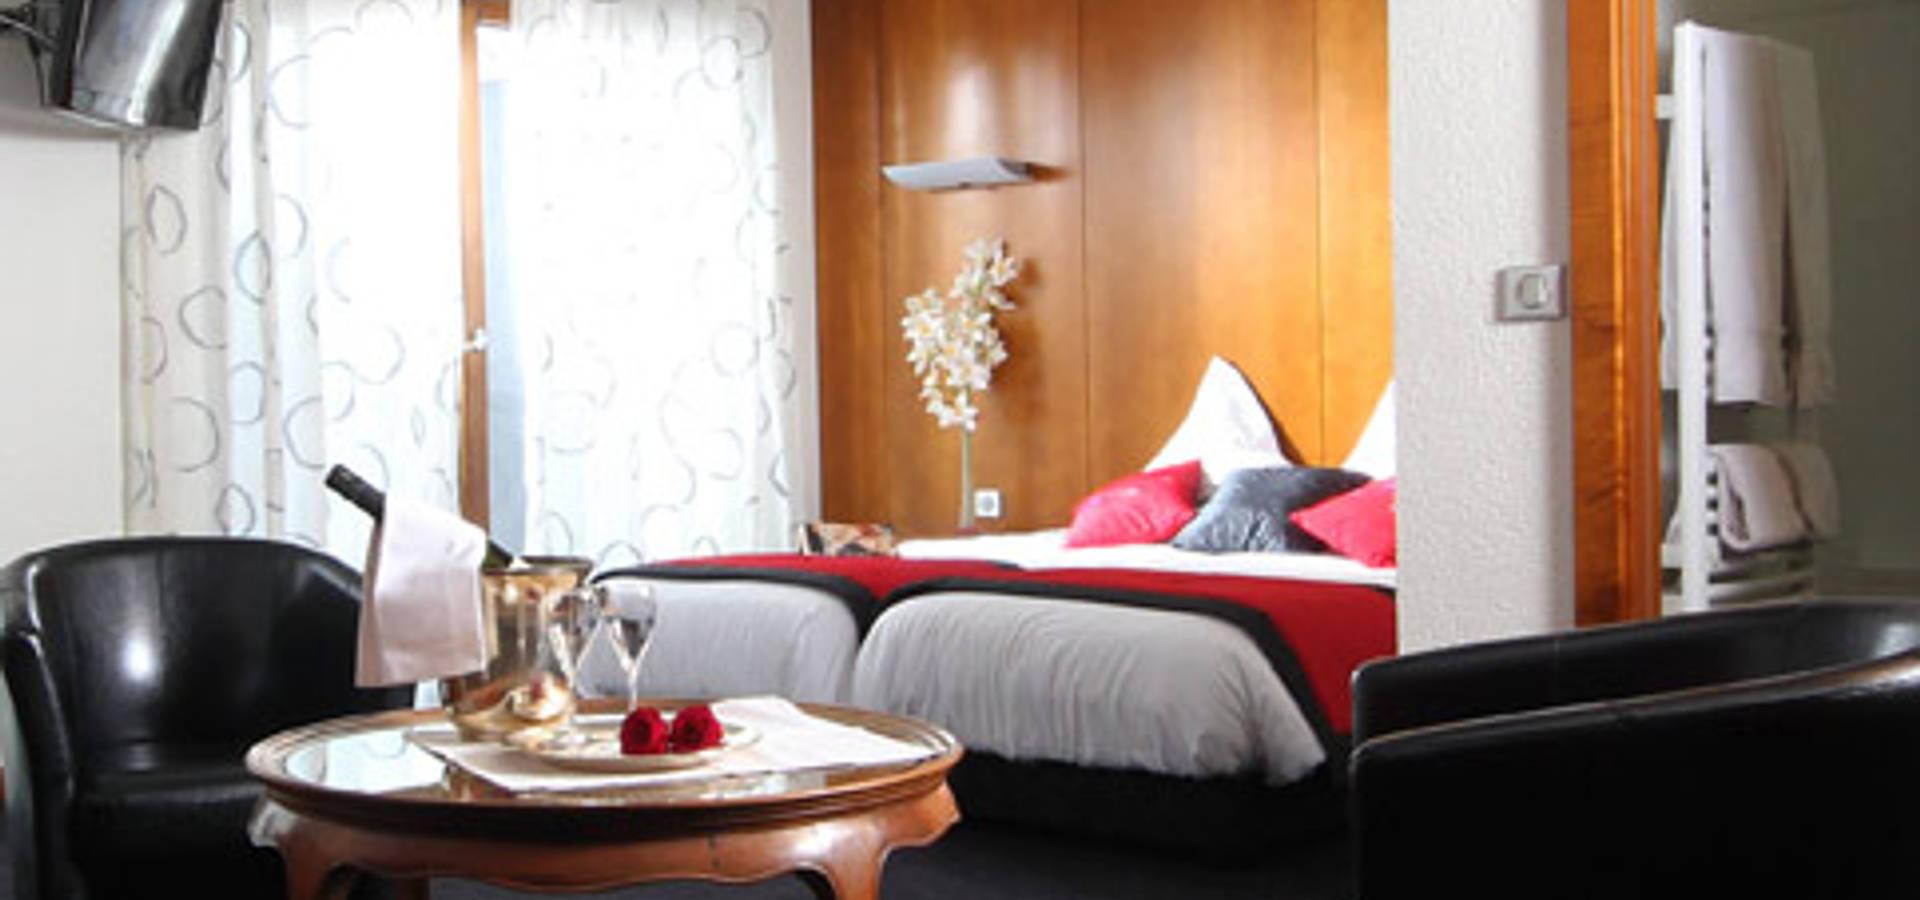 HOTEL RESTAURANT AU NID DE CIGOGNES